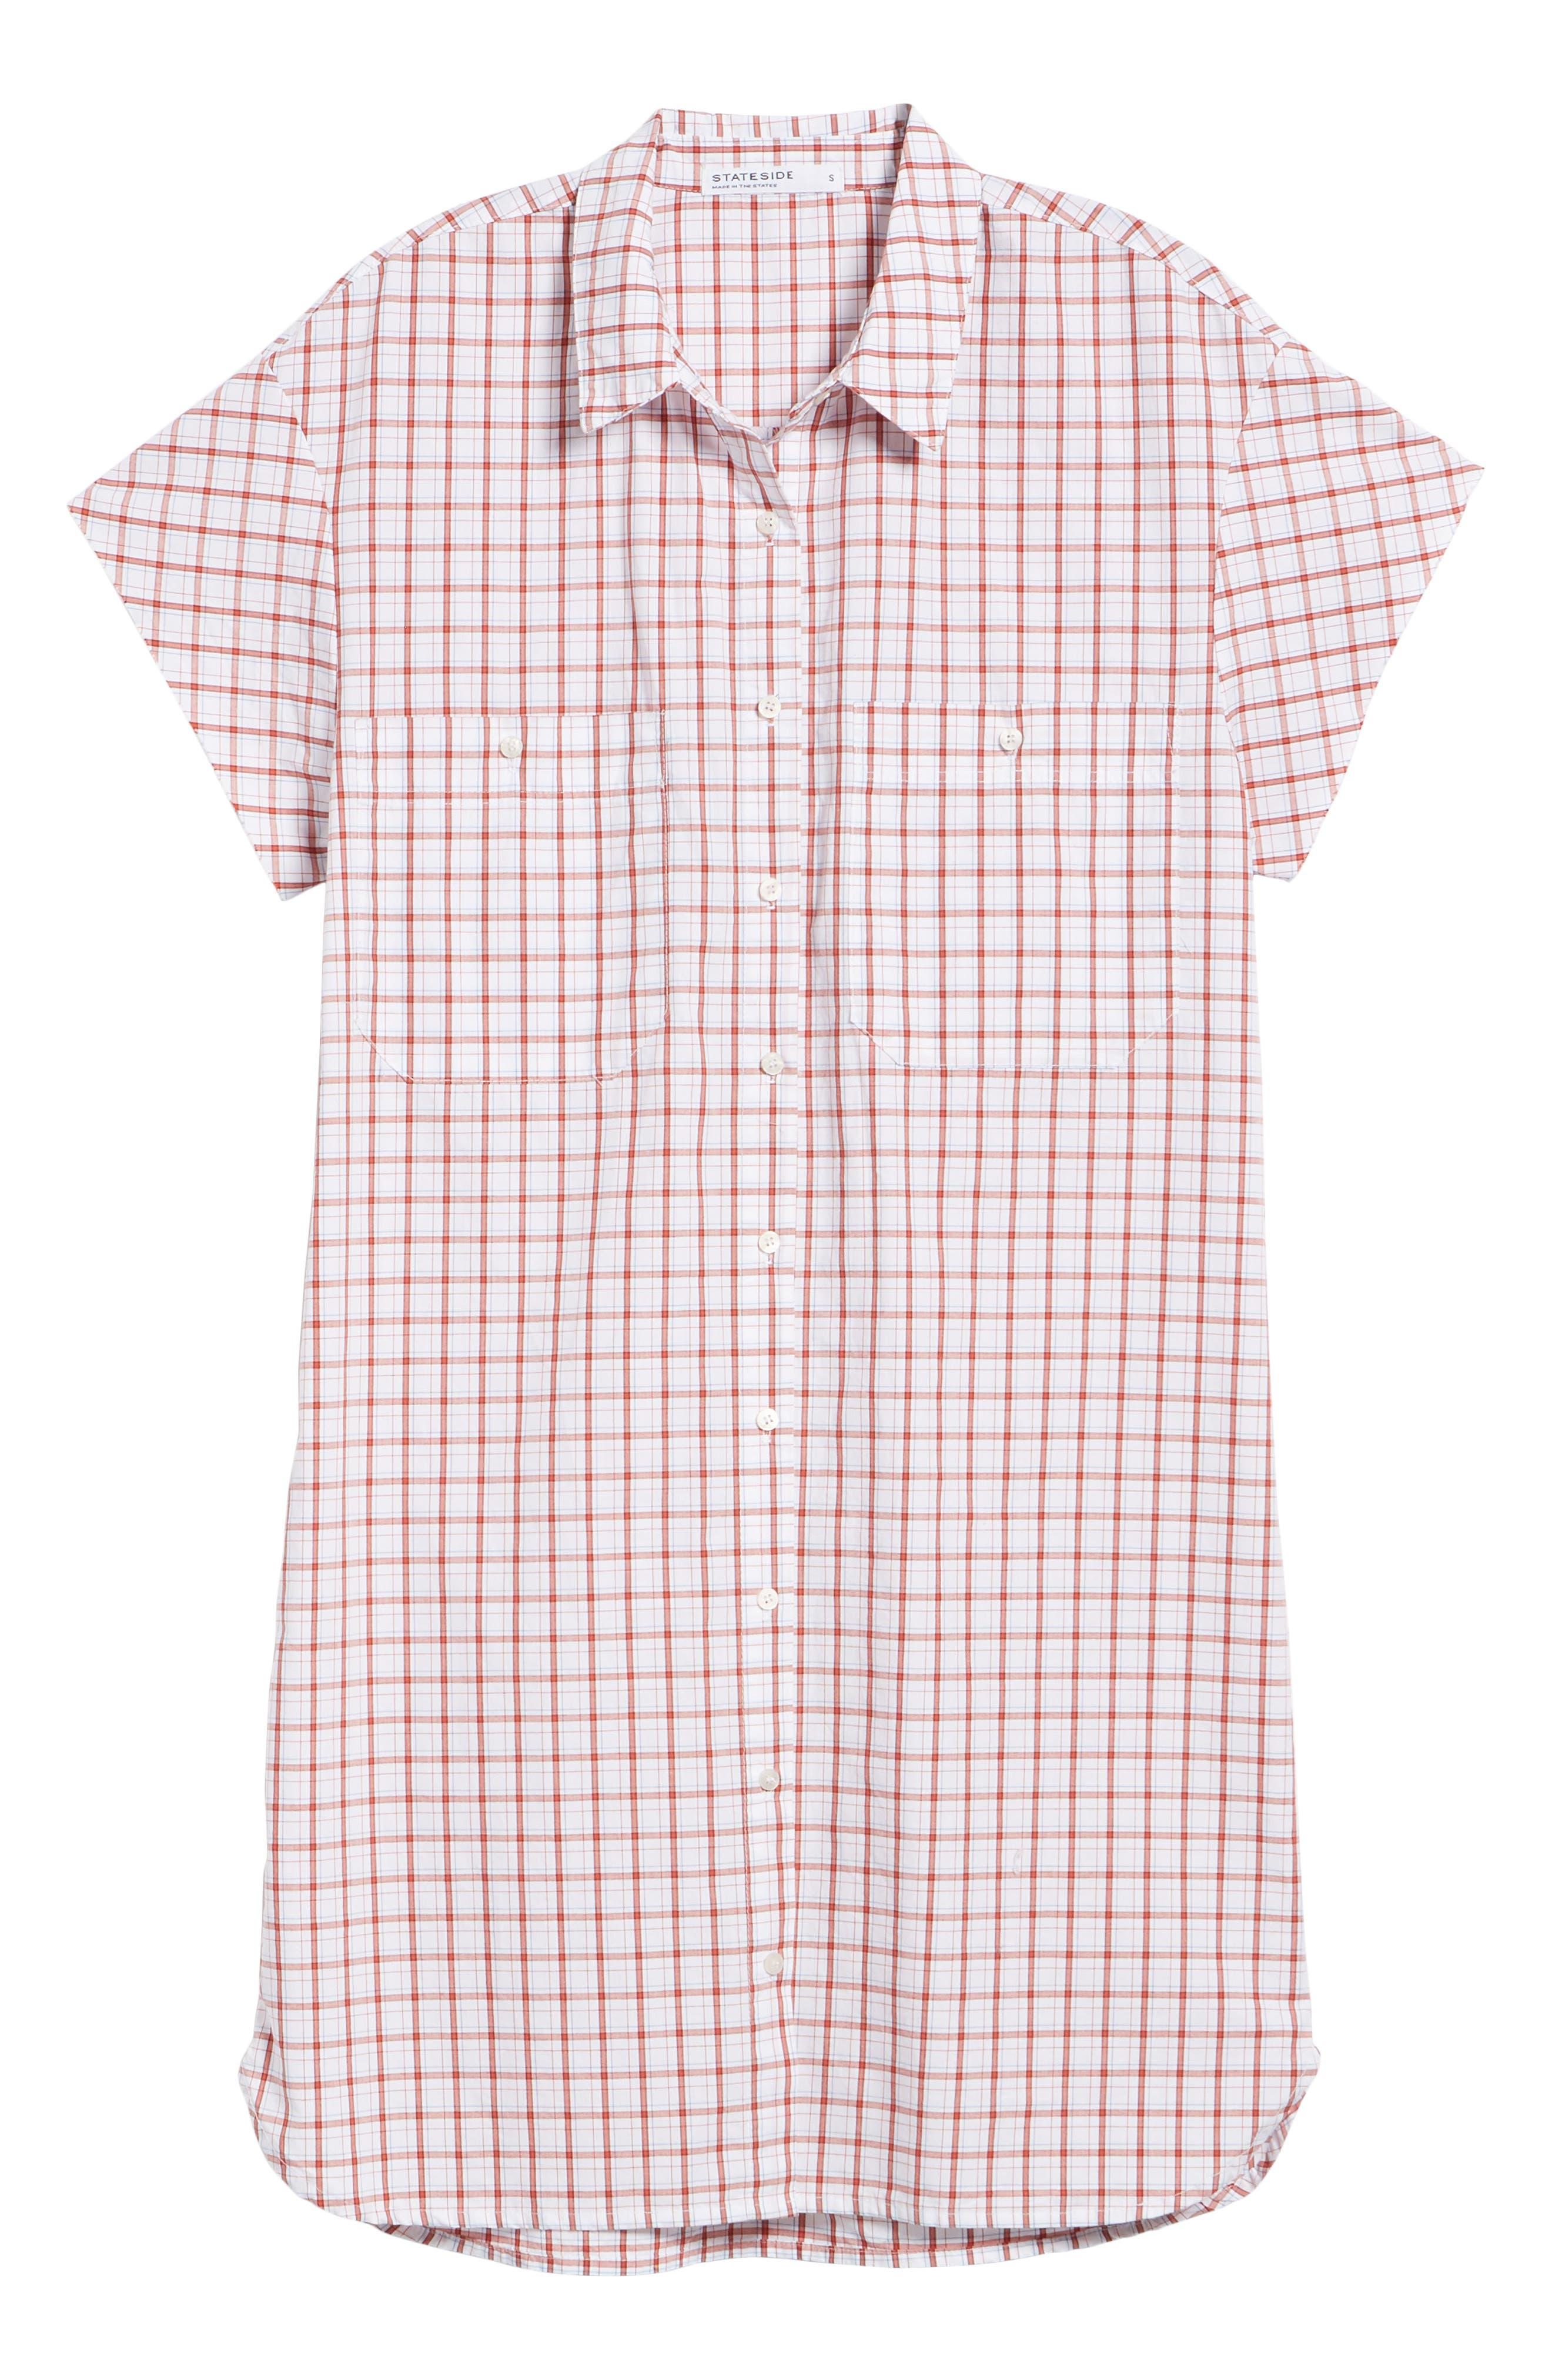 Oxford Shirtdress,                             Alternate thumbnail 6, color,                             Red Plaid